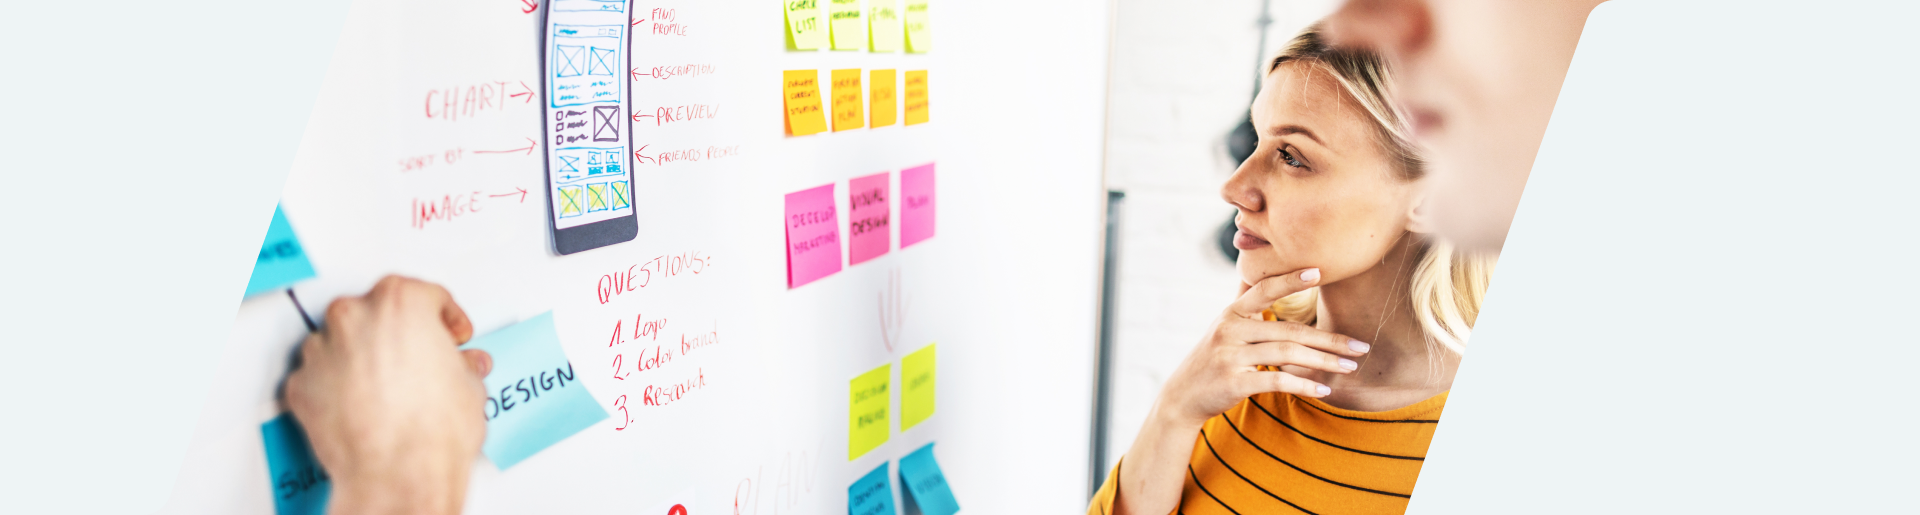 4 tips on choosing a mobile app development company